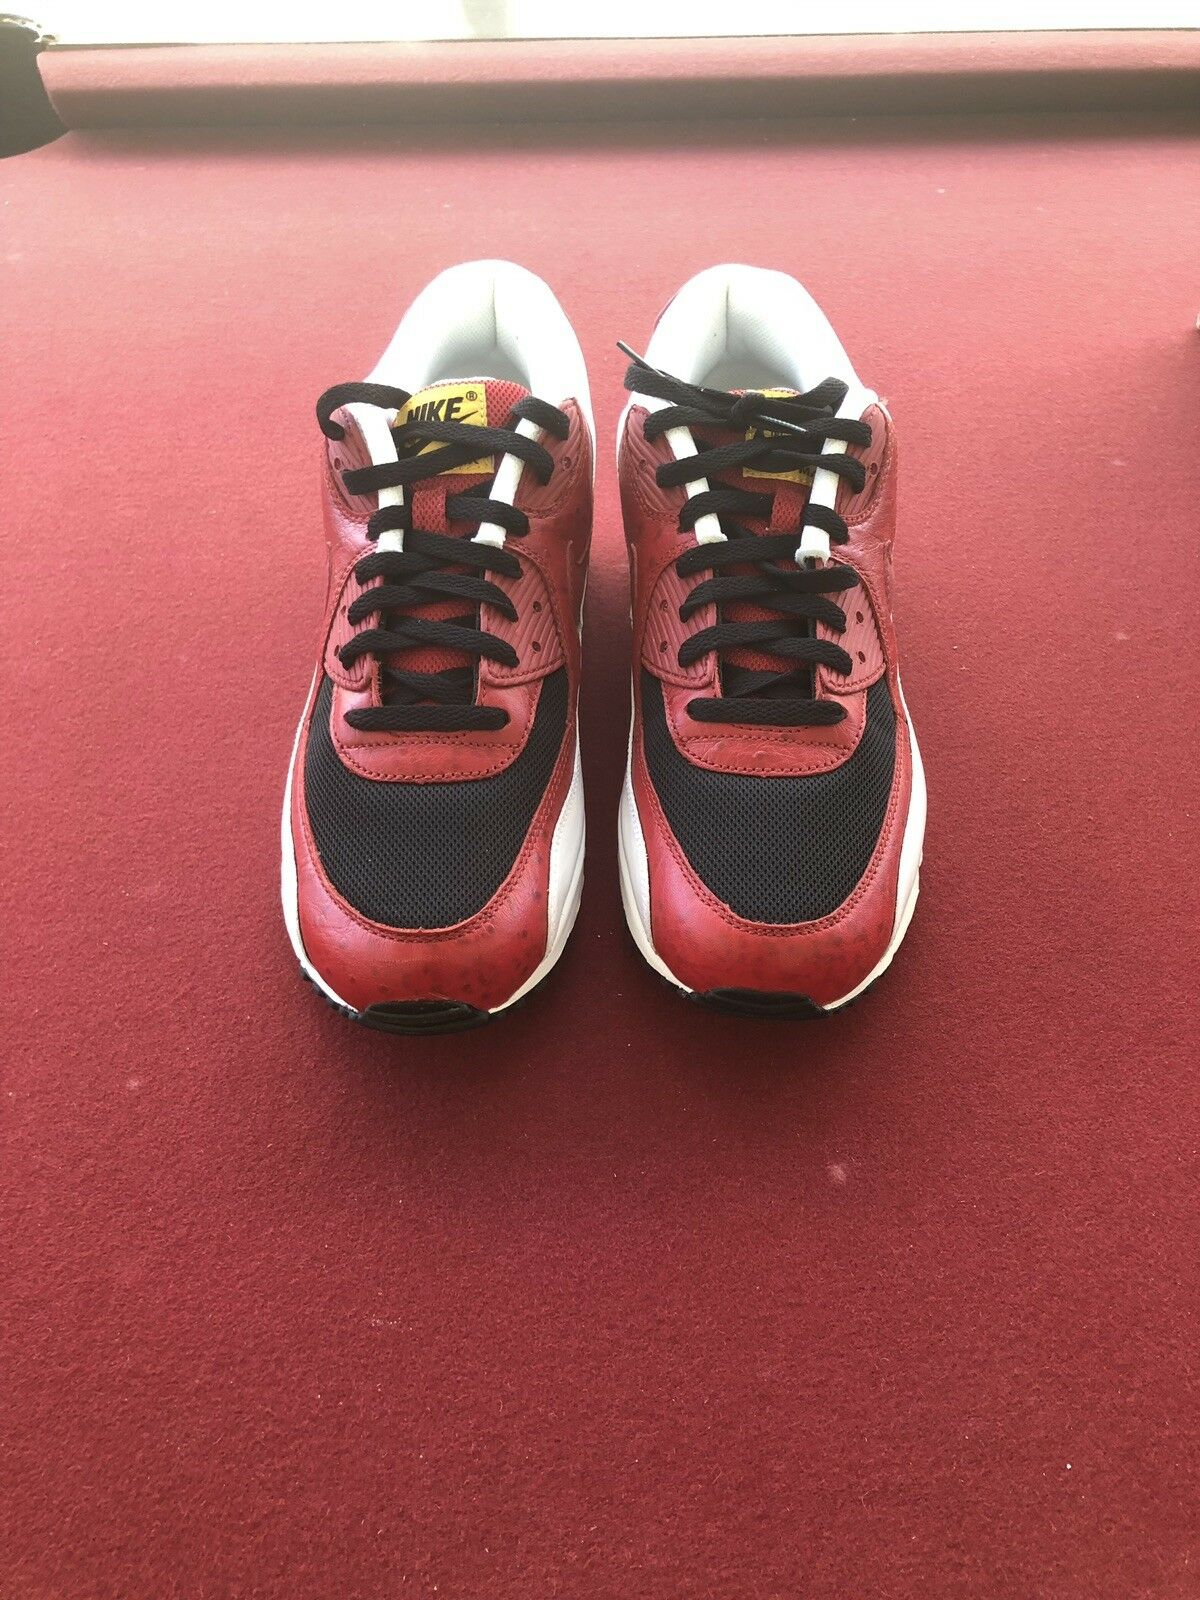 Nike Air Max 90 Black Varsity Red 325018-061 Size 10